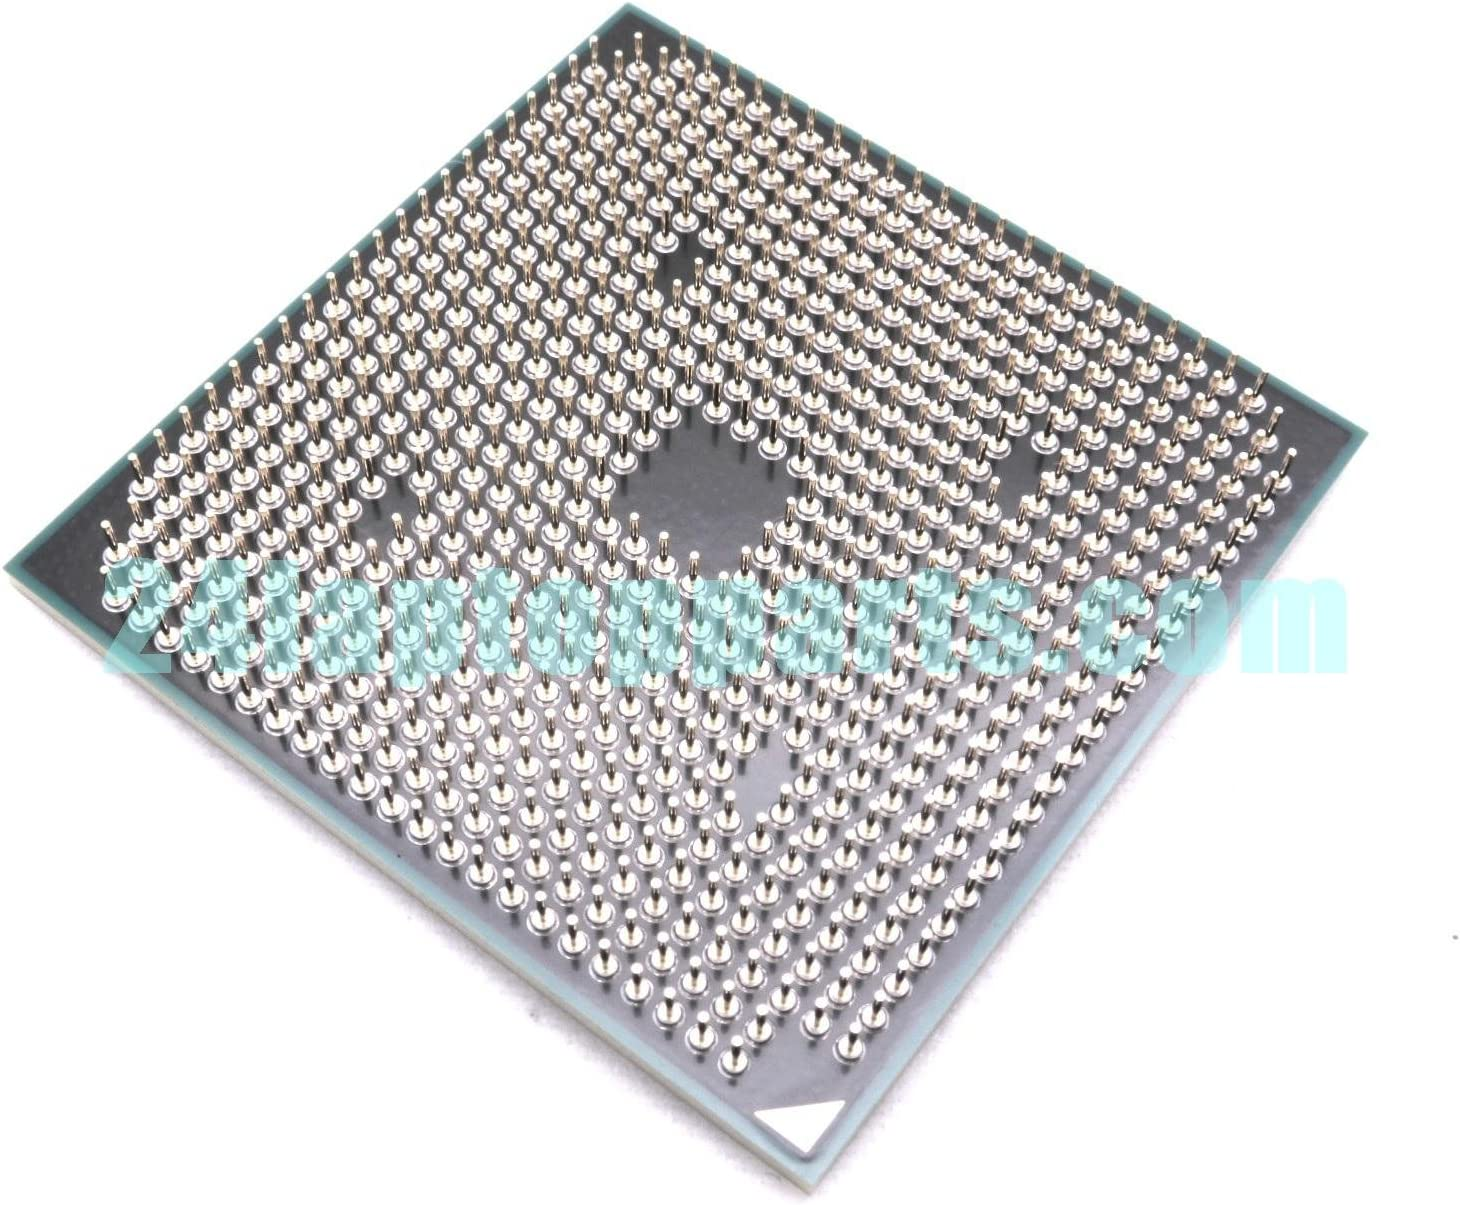 AMD Phenom II Triple-Core N830 Mobile CPU 2.1GHz 1536KB Socket S1G4 638pin HMN830DCR32GM